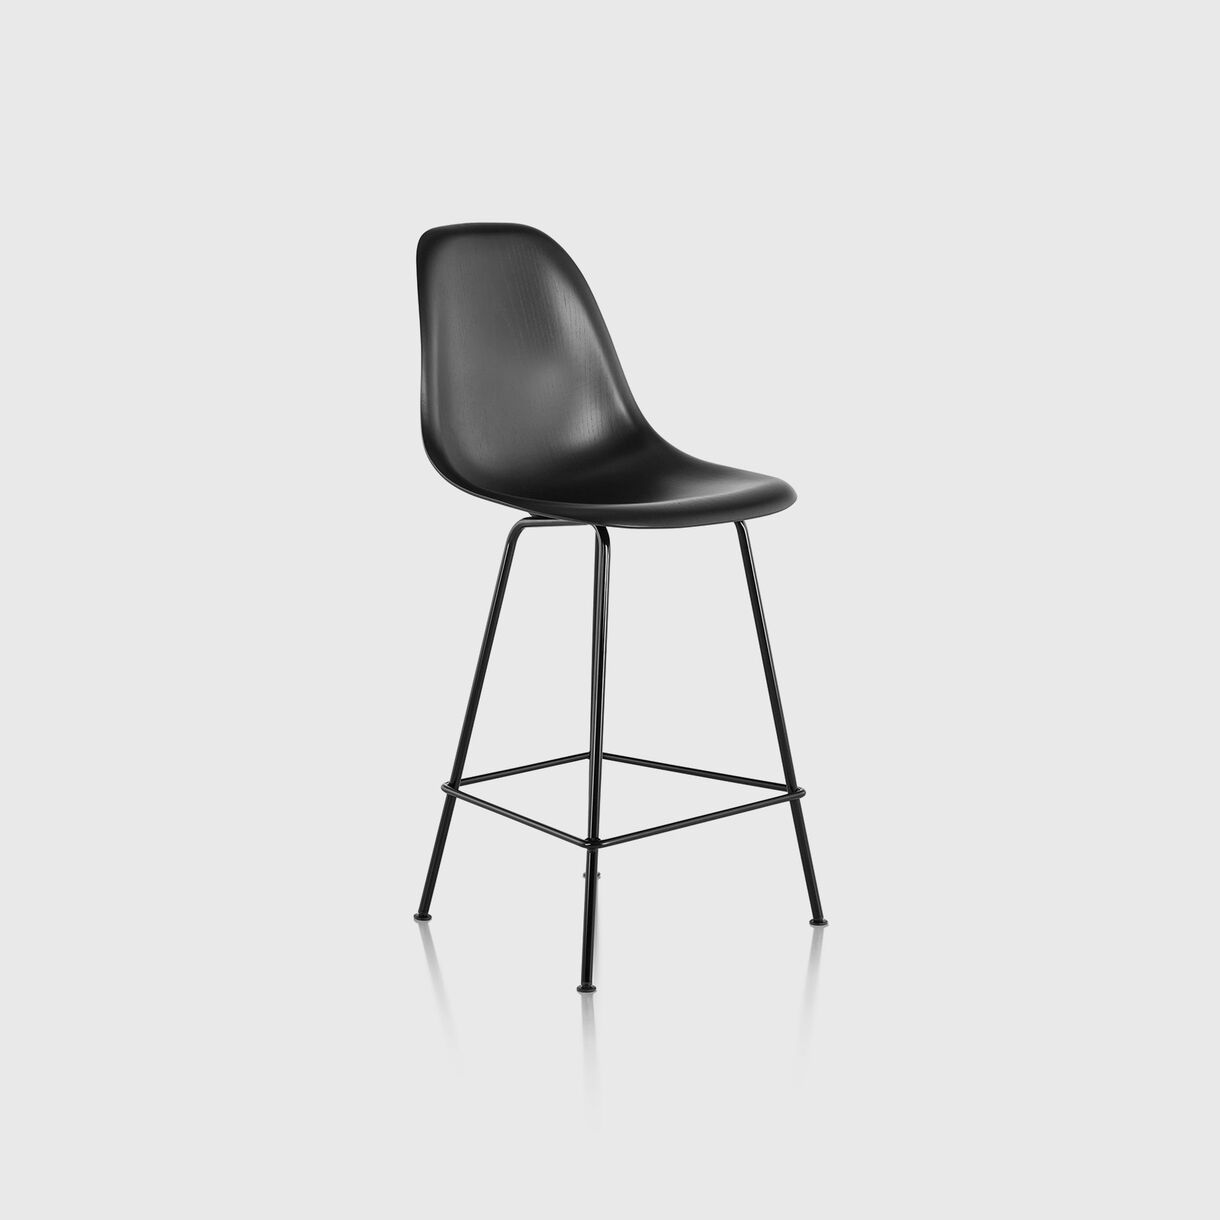 Eames Moulded Wood Counter Stool, Ebony & Black